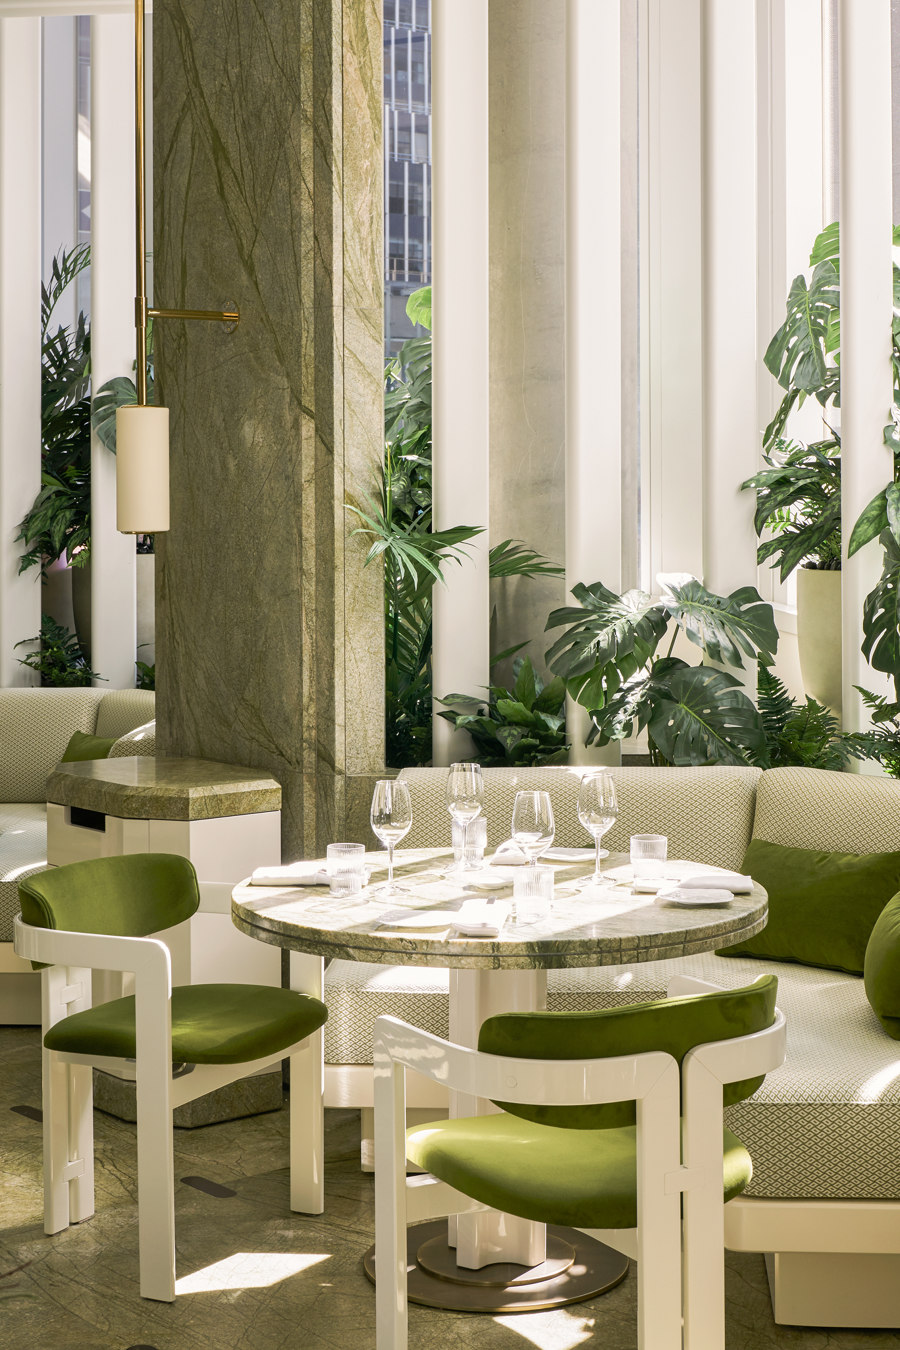 Le Jardinier by Joseph Dirand Architecture | Restaurant interiors